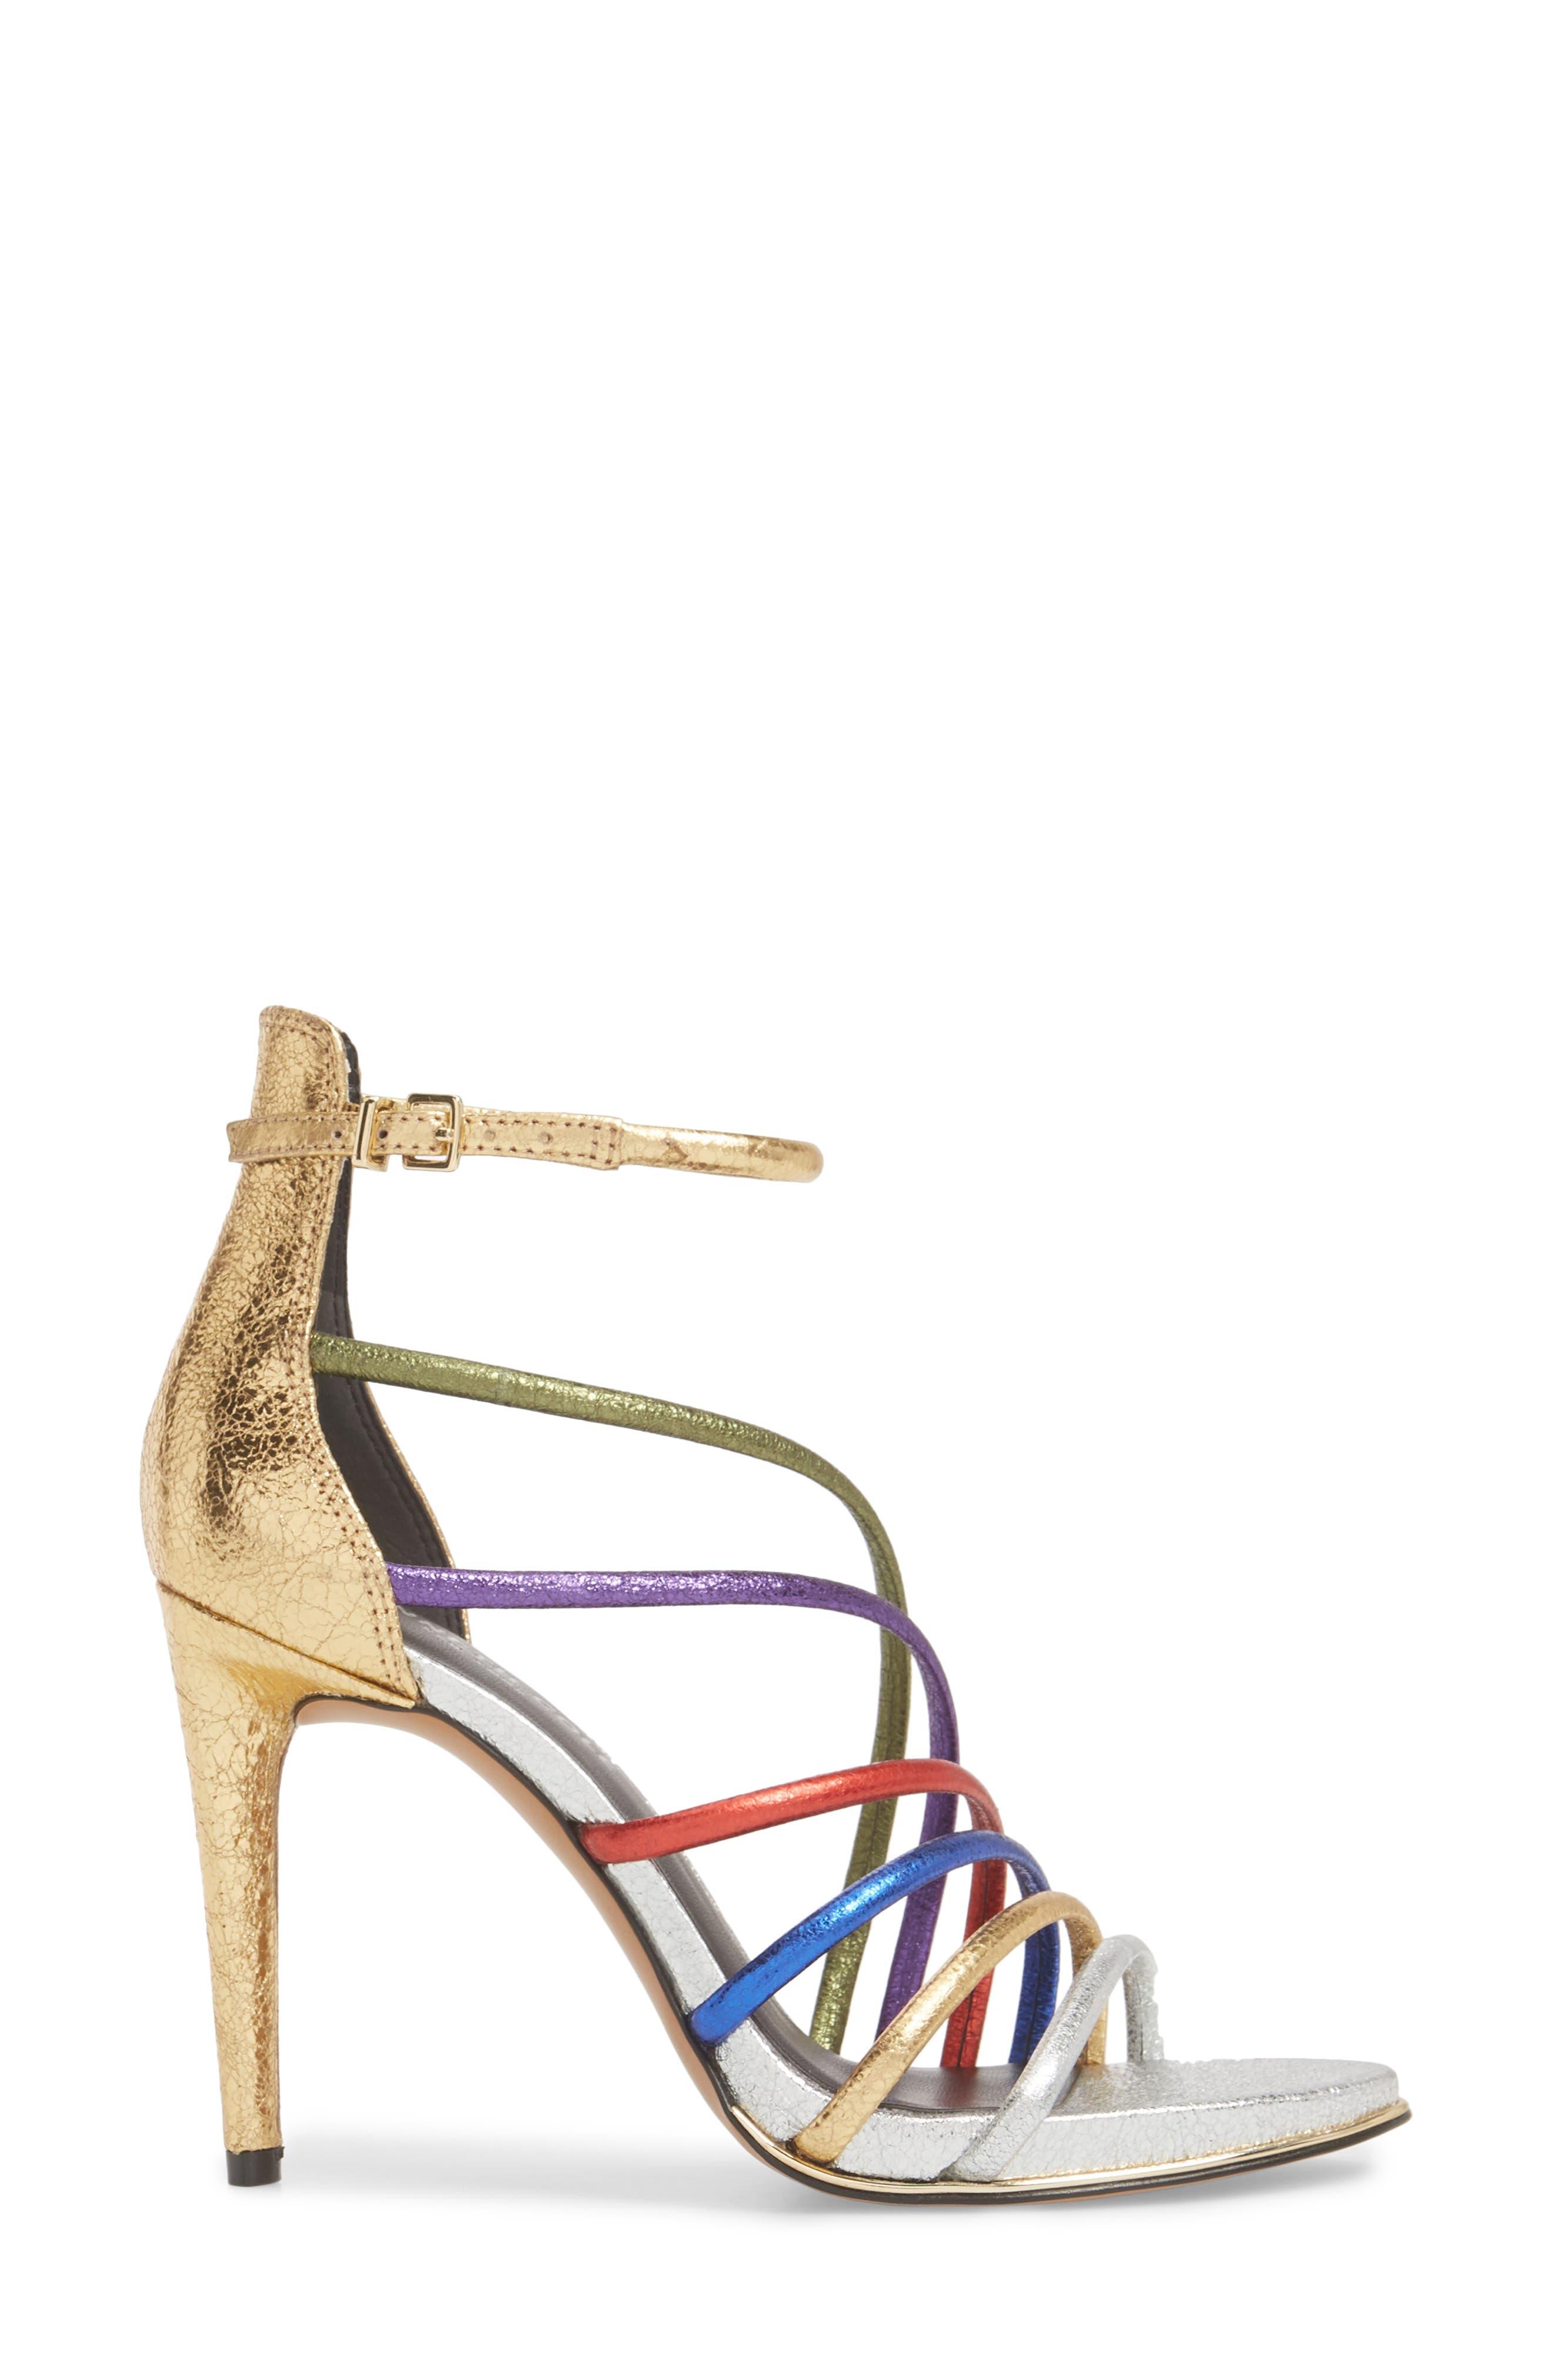 Barletta Asymmetrical Strappy Sandal,                             Alternate thumbnail 3, color,                             MULTI LEATHER